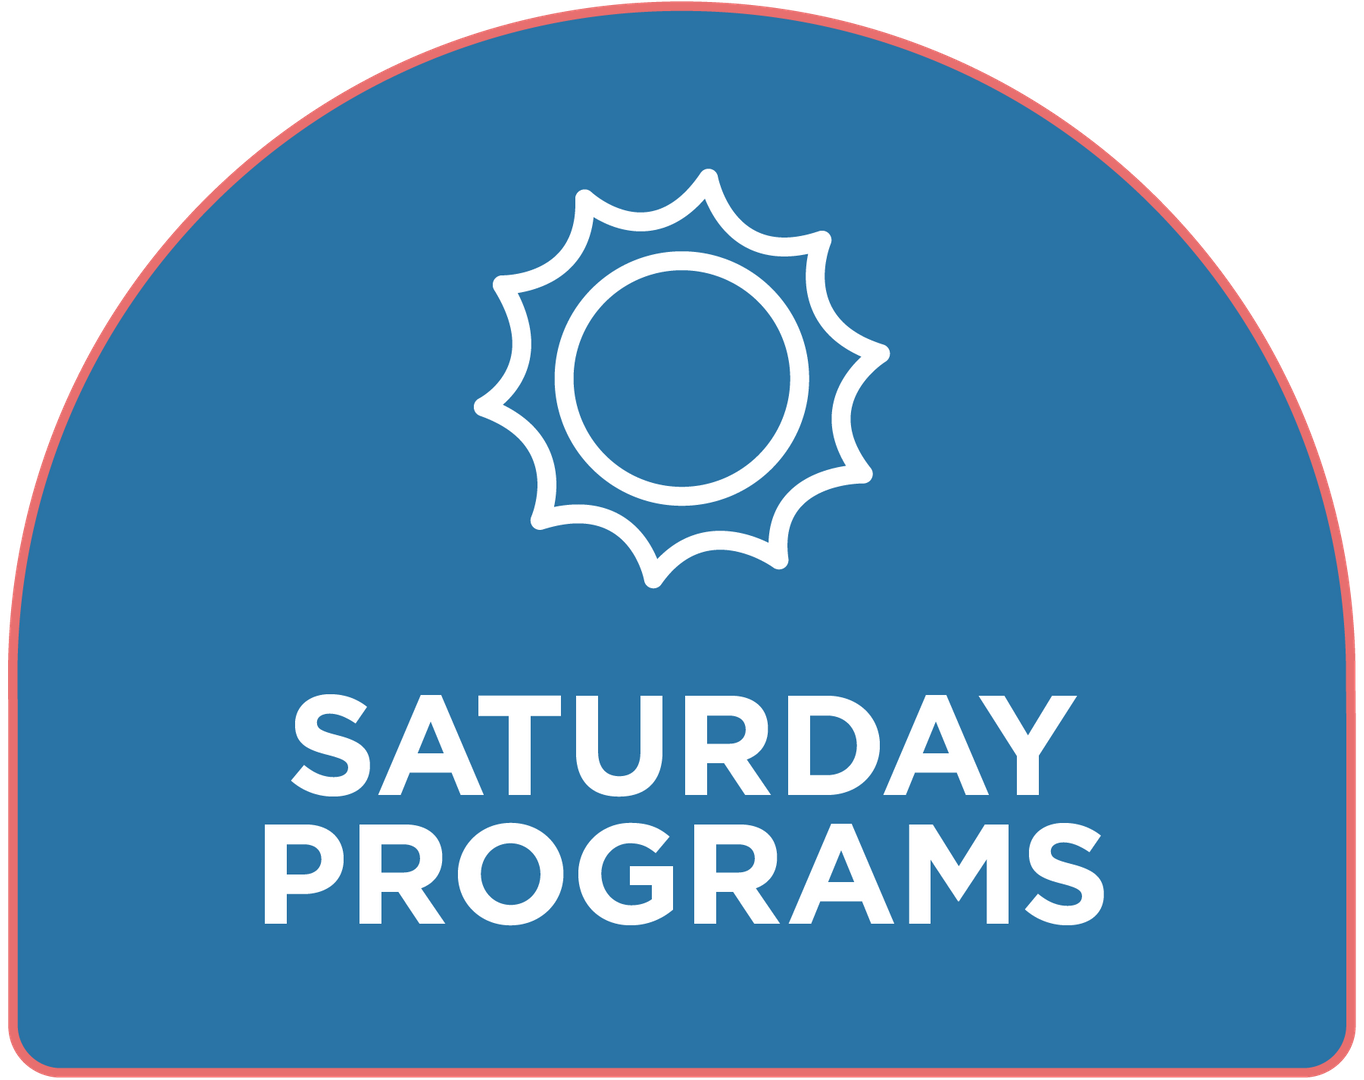 Saturday Programs